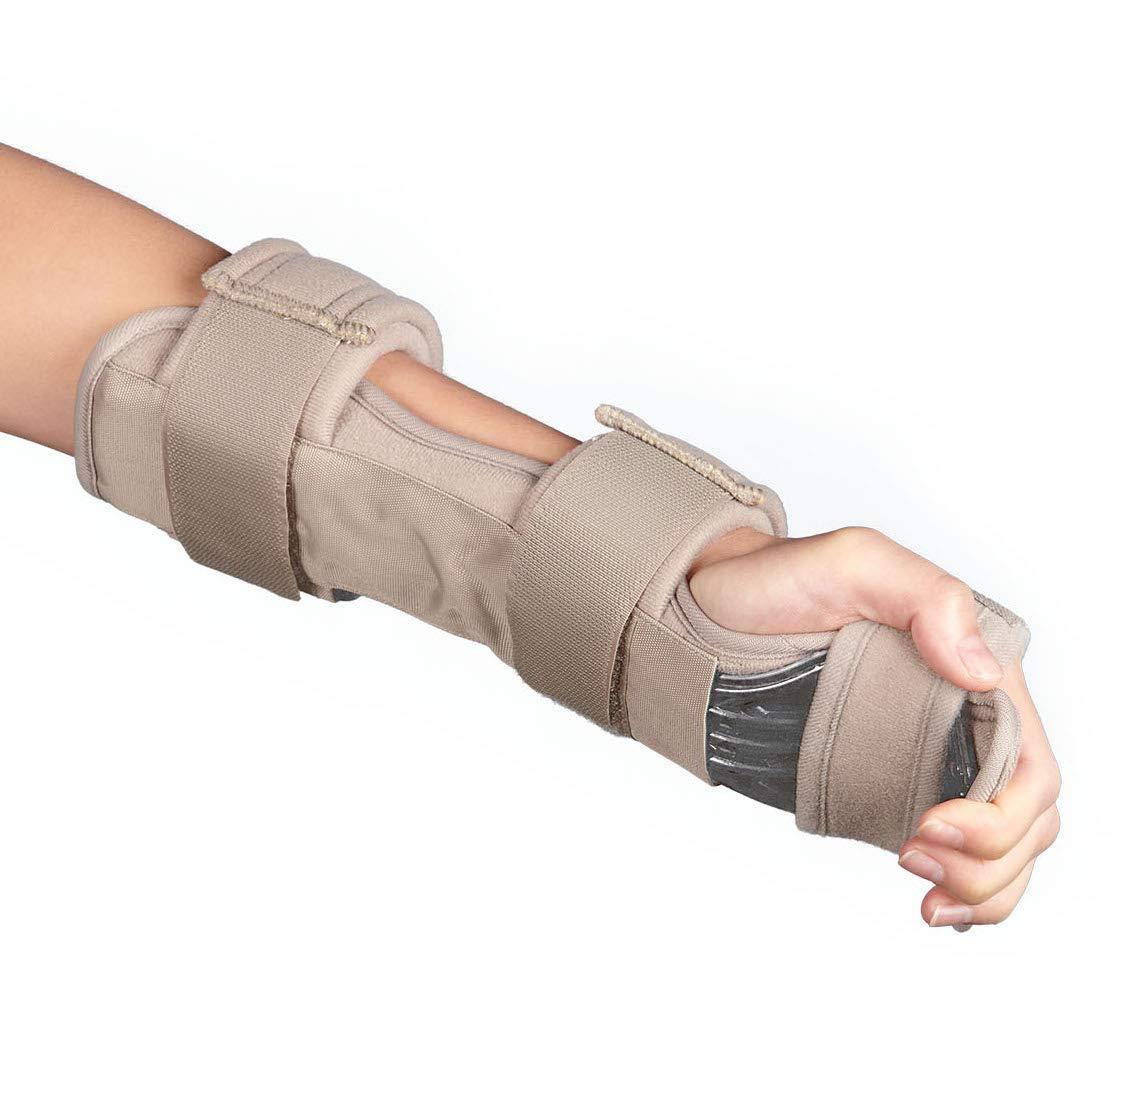 Stroke Hand Brace Support Hand Splint Soft Professional Functional Resting Hand Splint Night Wrist Splint Support Immobilizer Finger Wrist Fracture -1 Unit (Universal) by Rewind With Nature